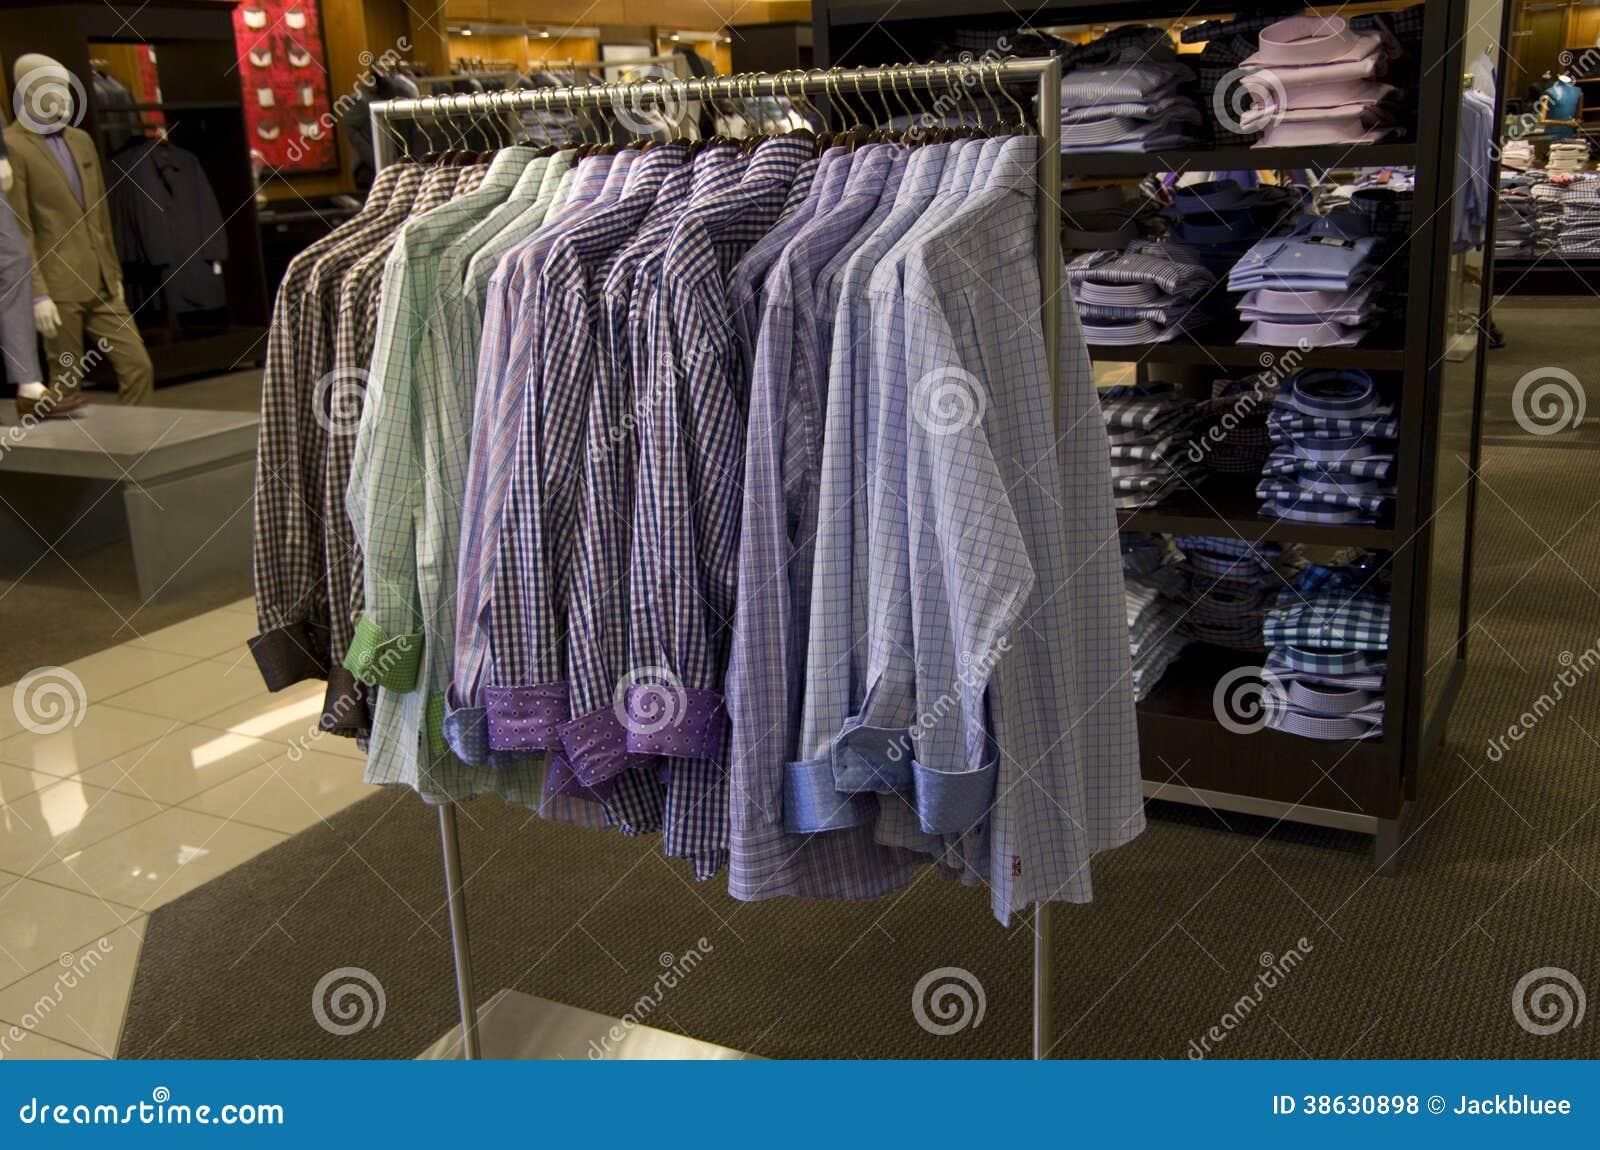 Royalty Free Stock Photos: Men clothing fashion department store